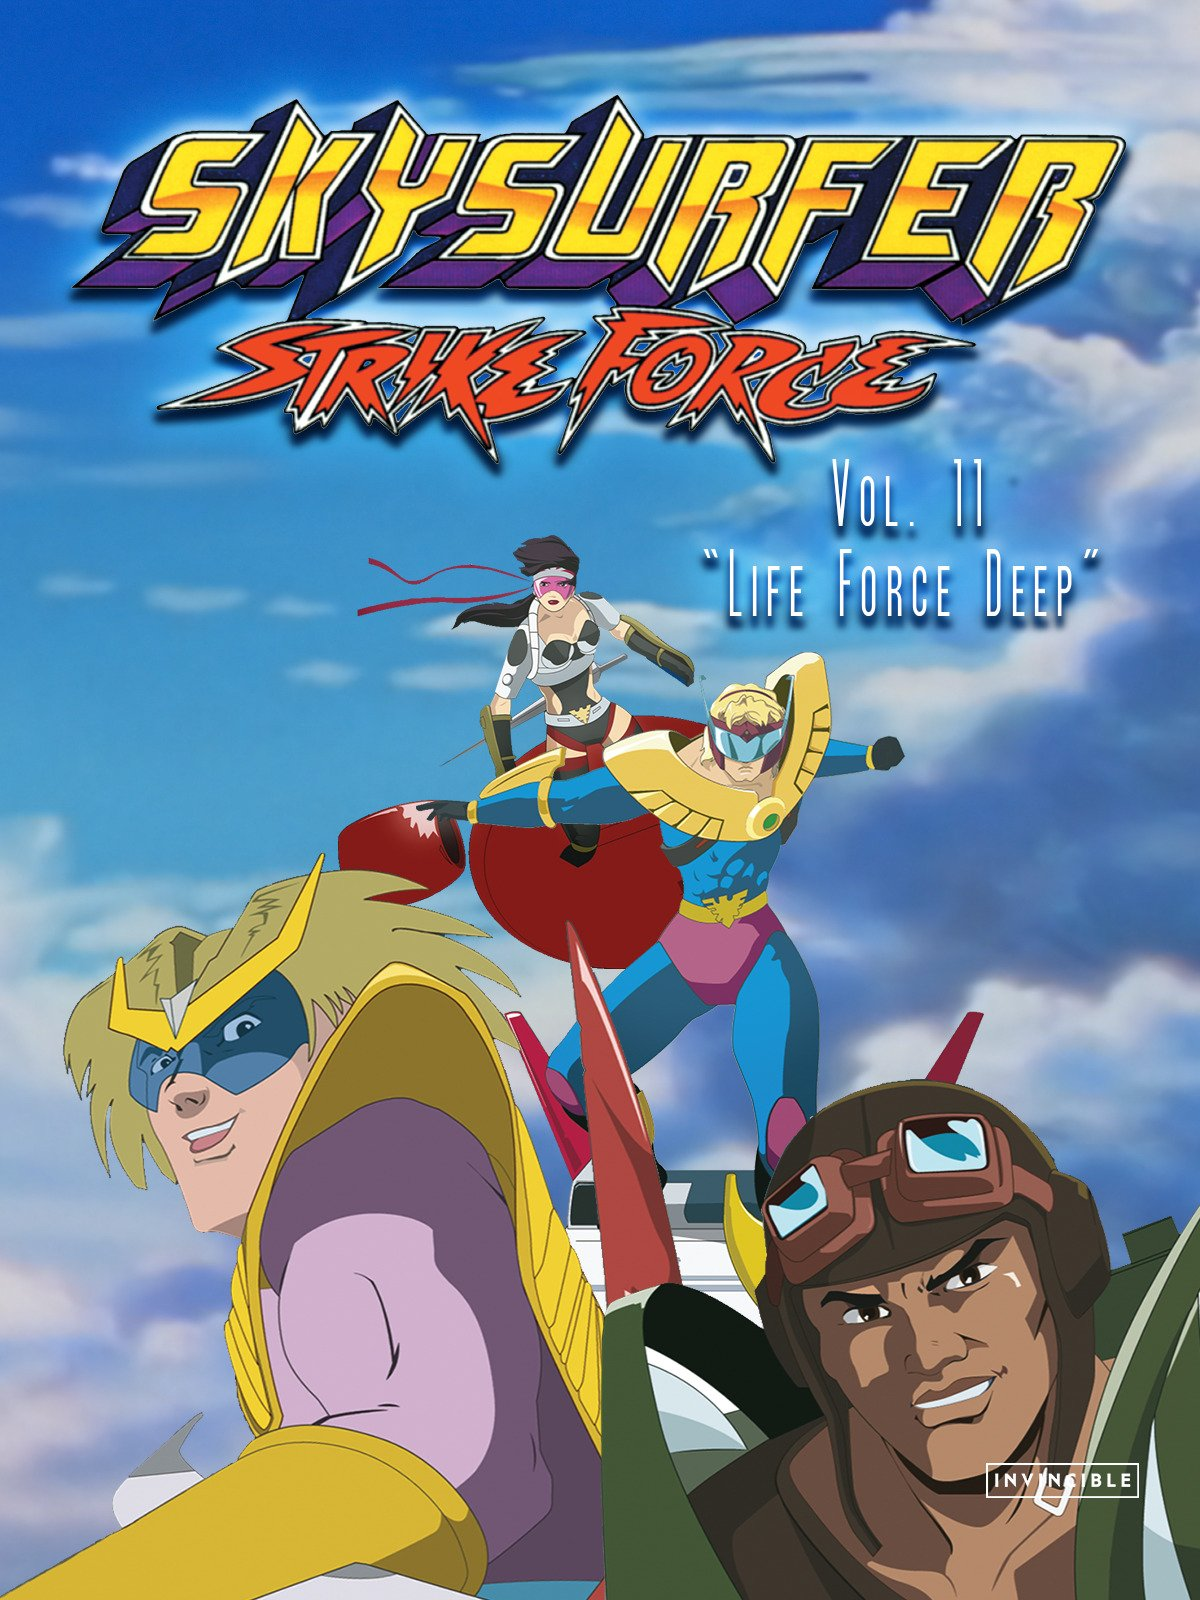 Skysurfer Strike Force Vol. 11Life Force Deep